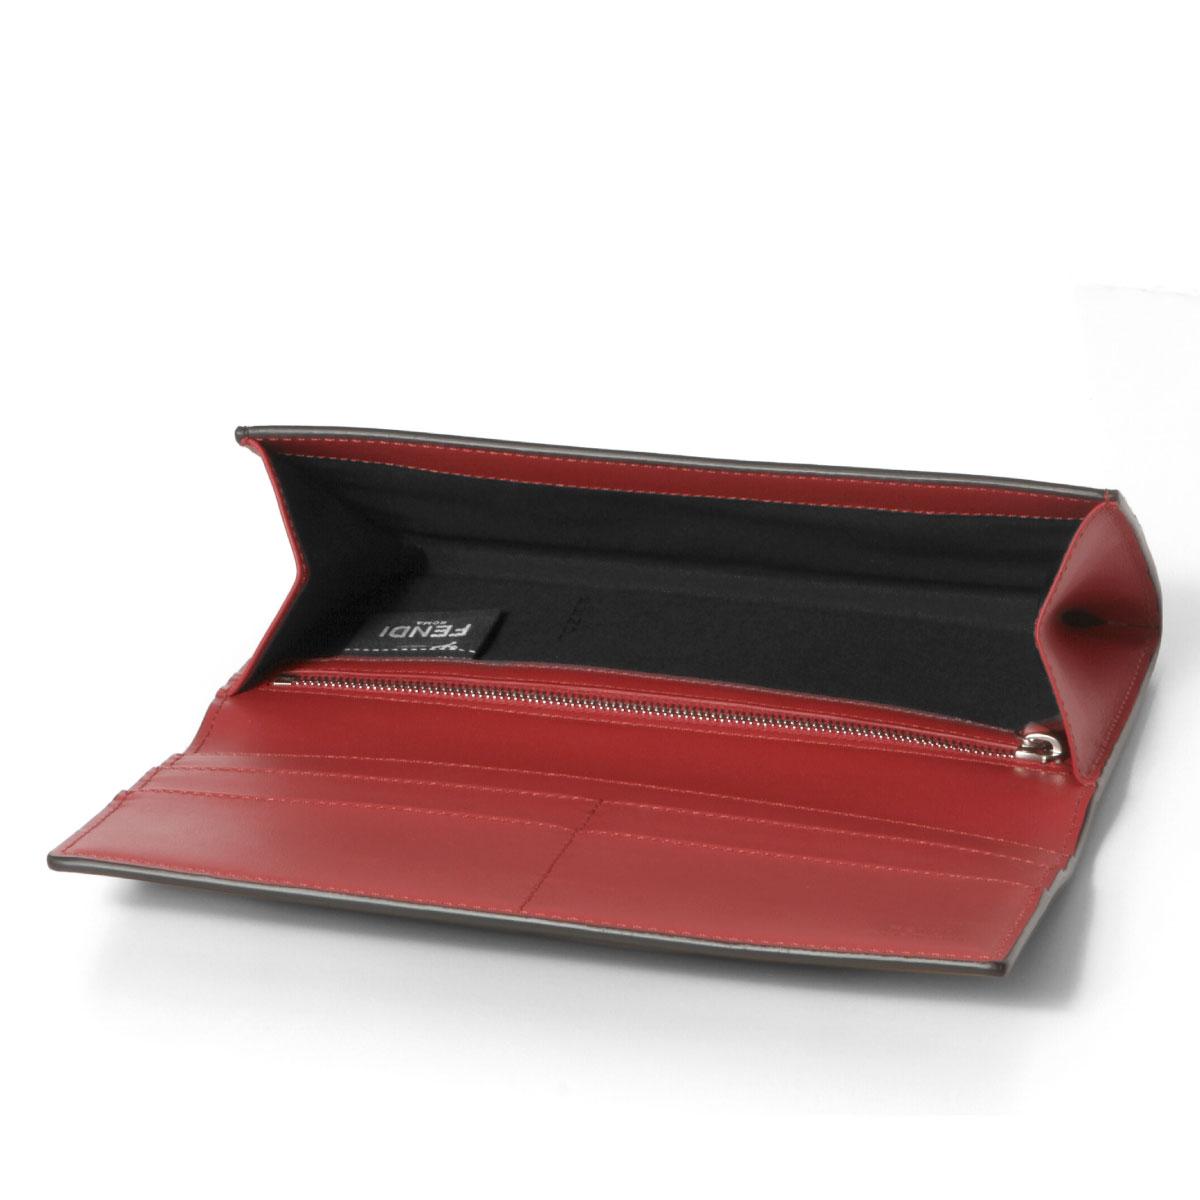 cf4f875f Fendi FENDI wallet men 7M0264 O73 F0U9T folio long wallet BAG BUGS bag bugs  NERO+GIALLO+ROSSO black